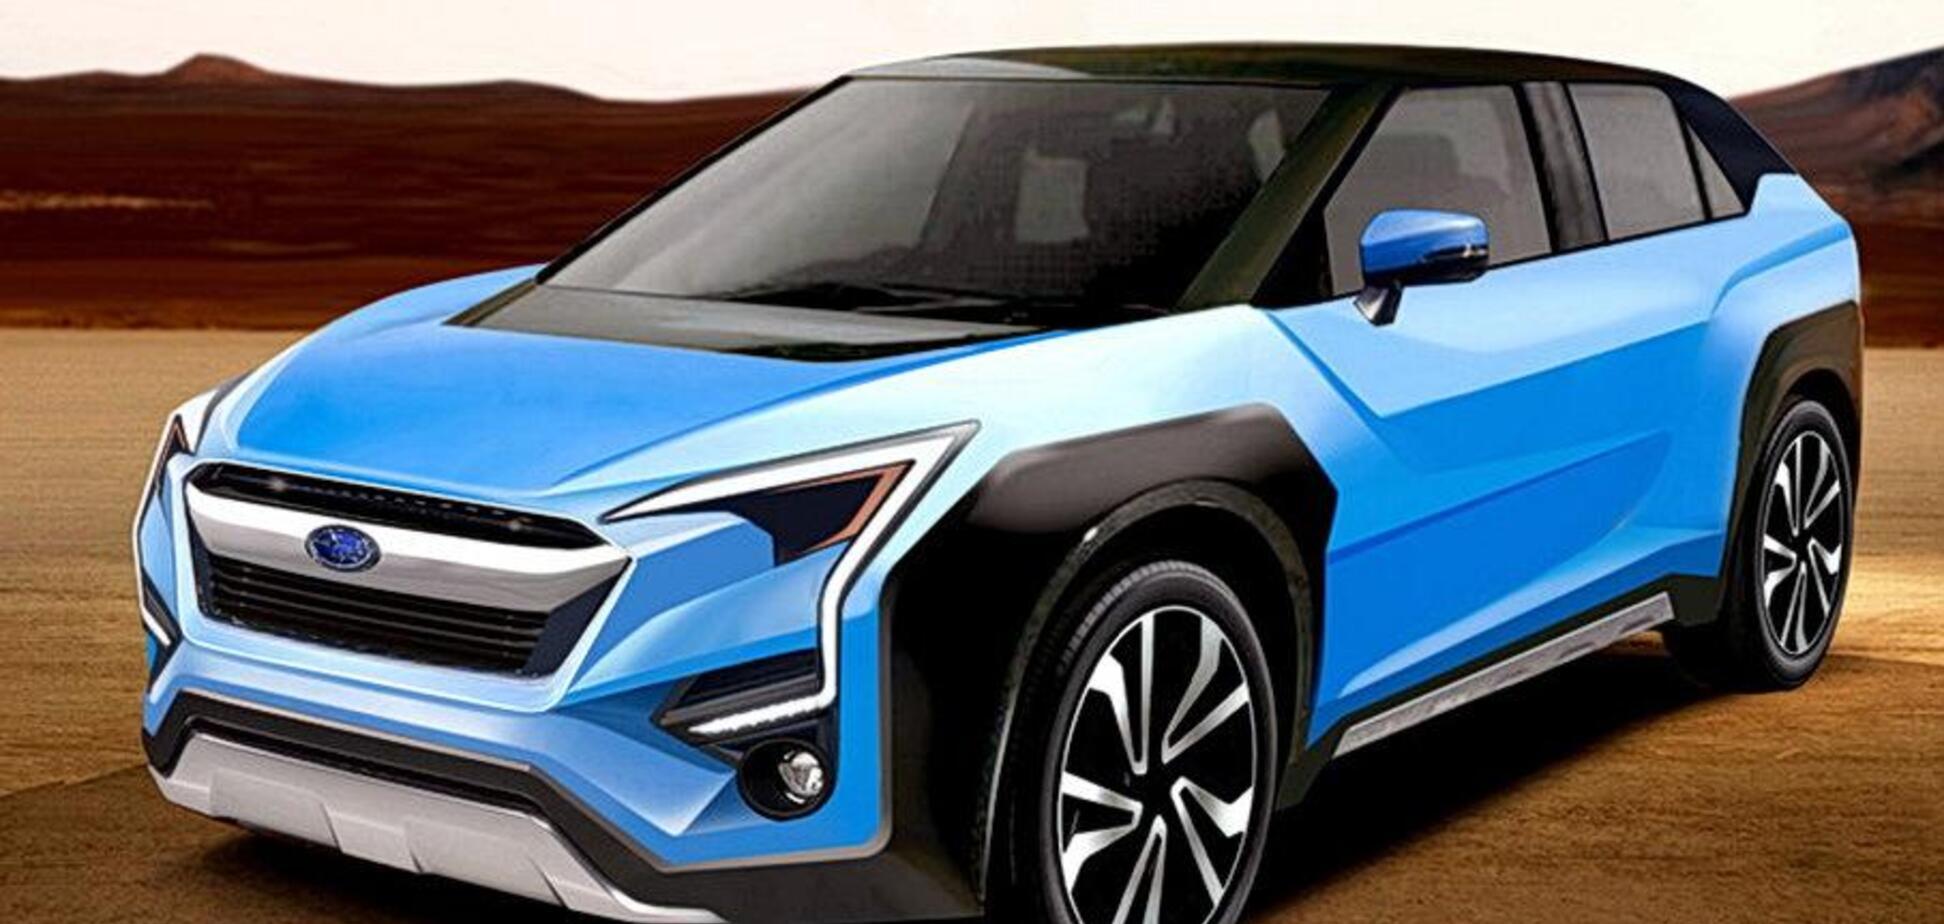 Первый электромобиль Subaru: 290 сил, привод 4х4 и 500 км хода